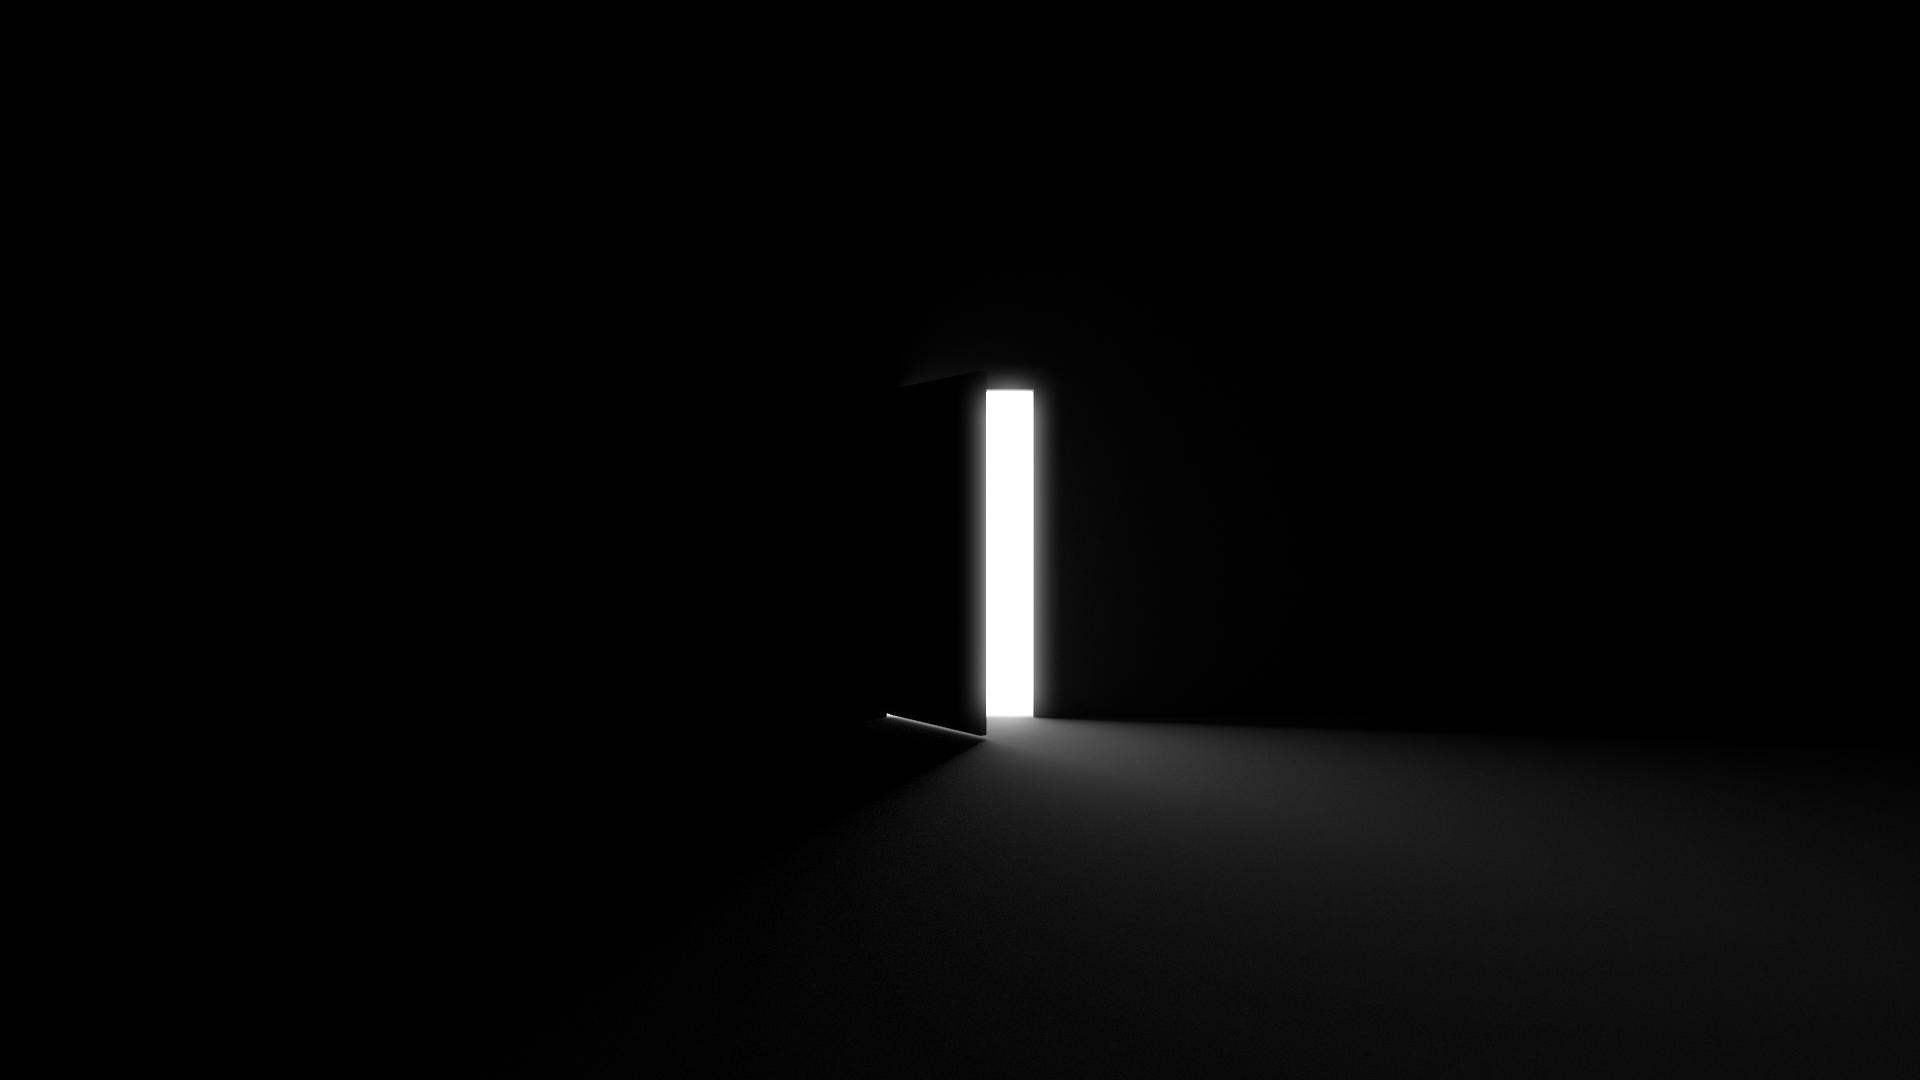 The Door 1920x1080 By DataNalle The Door 1920x1080 By DataNalle